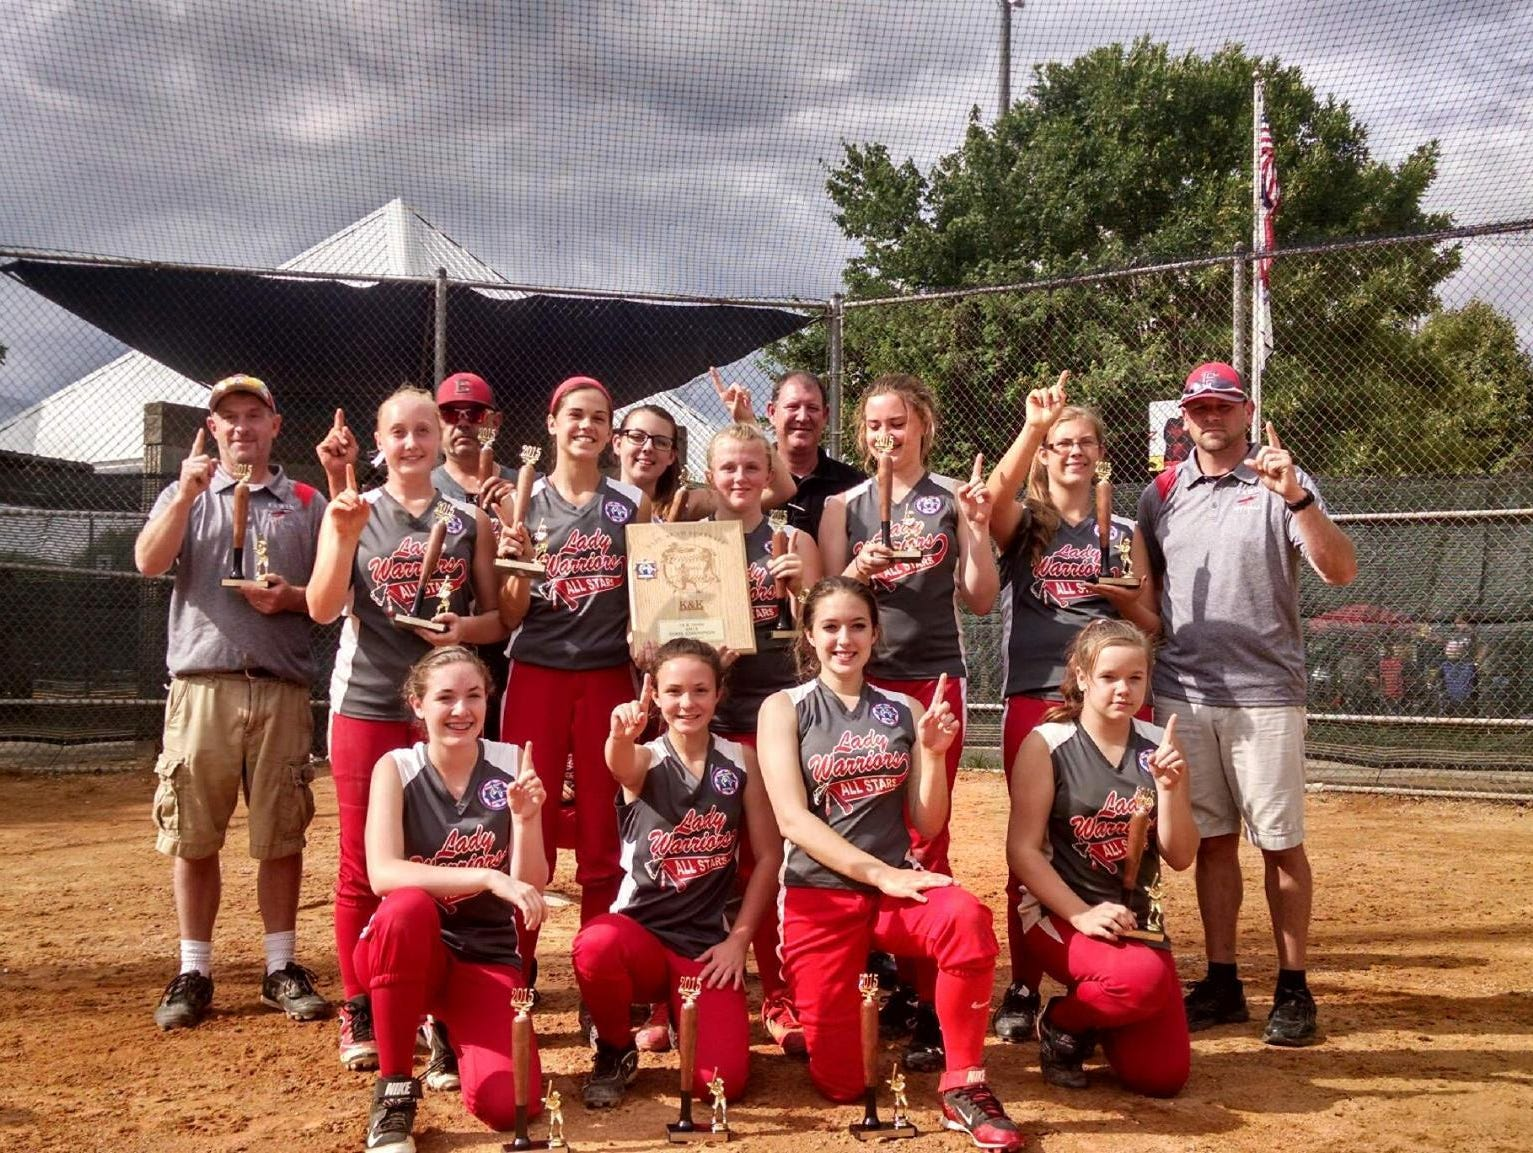 The Erwin 14U softball team.